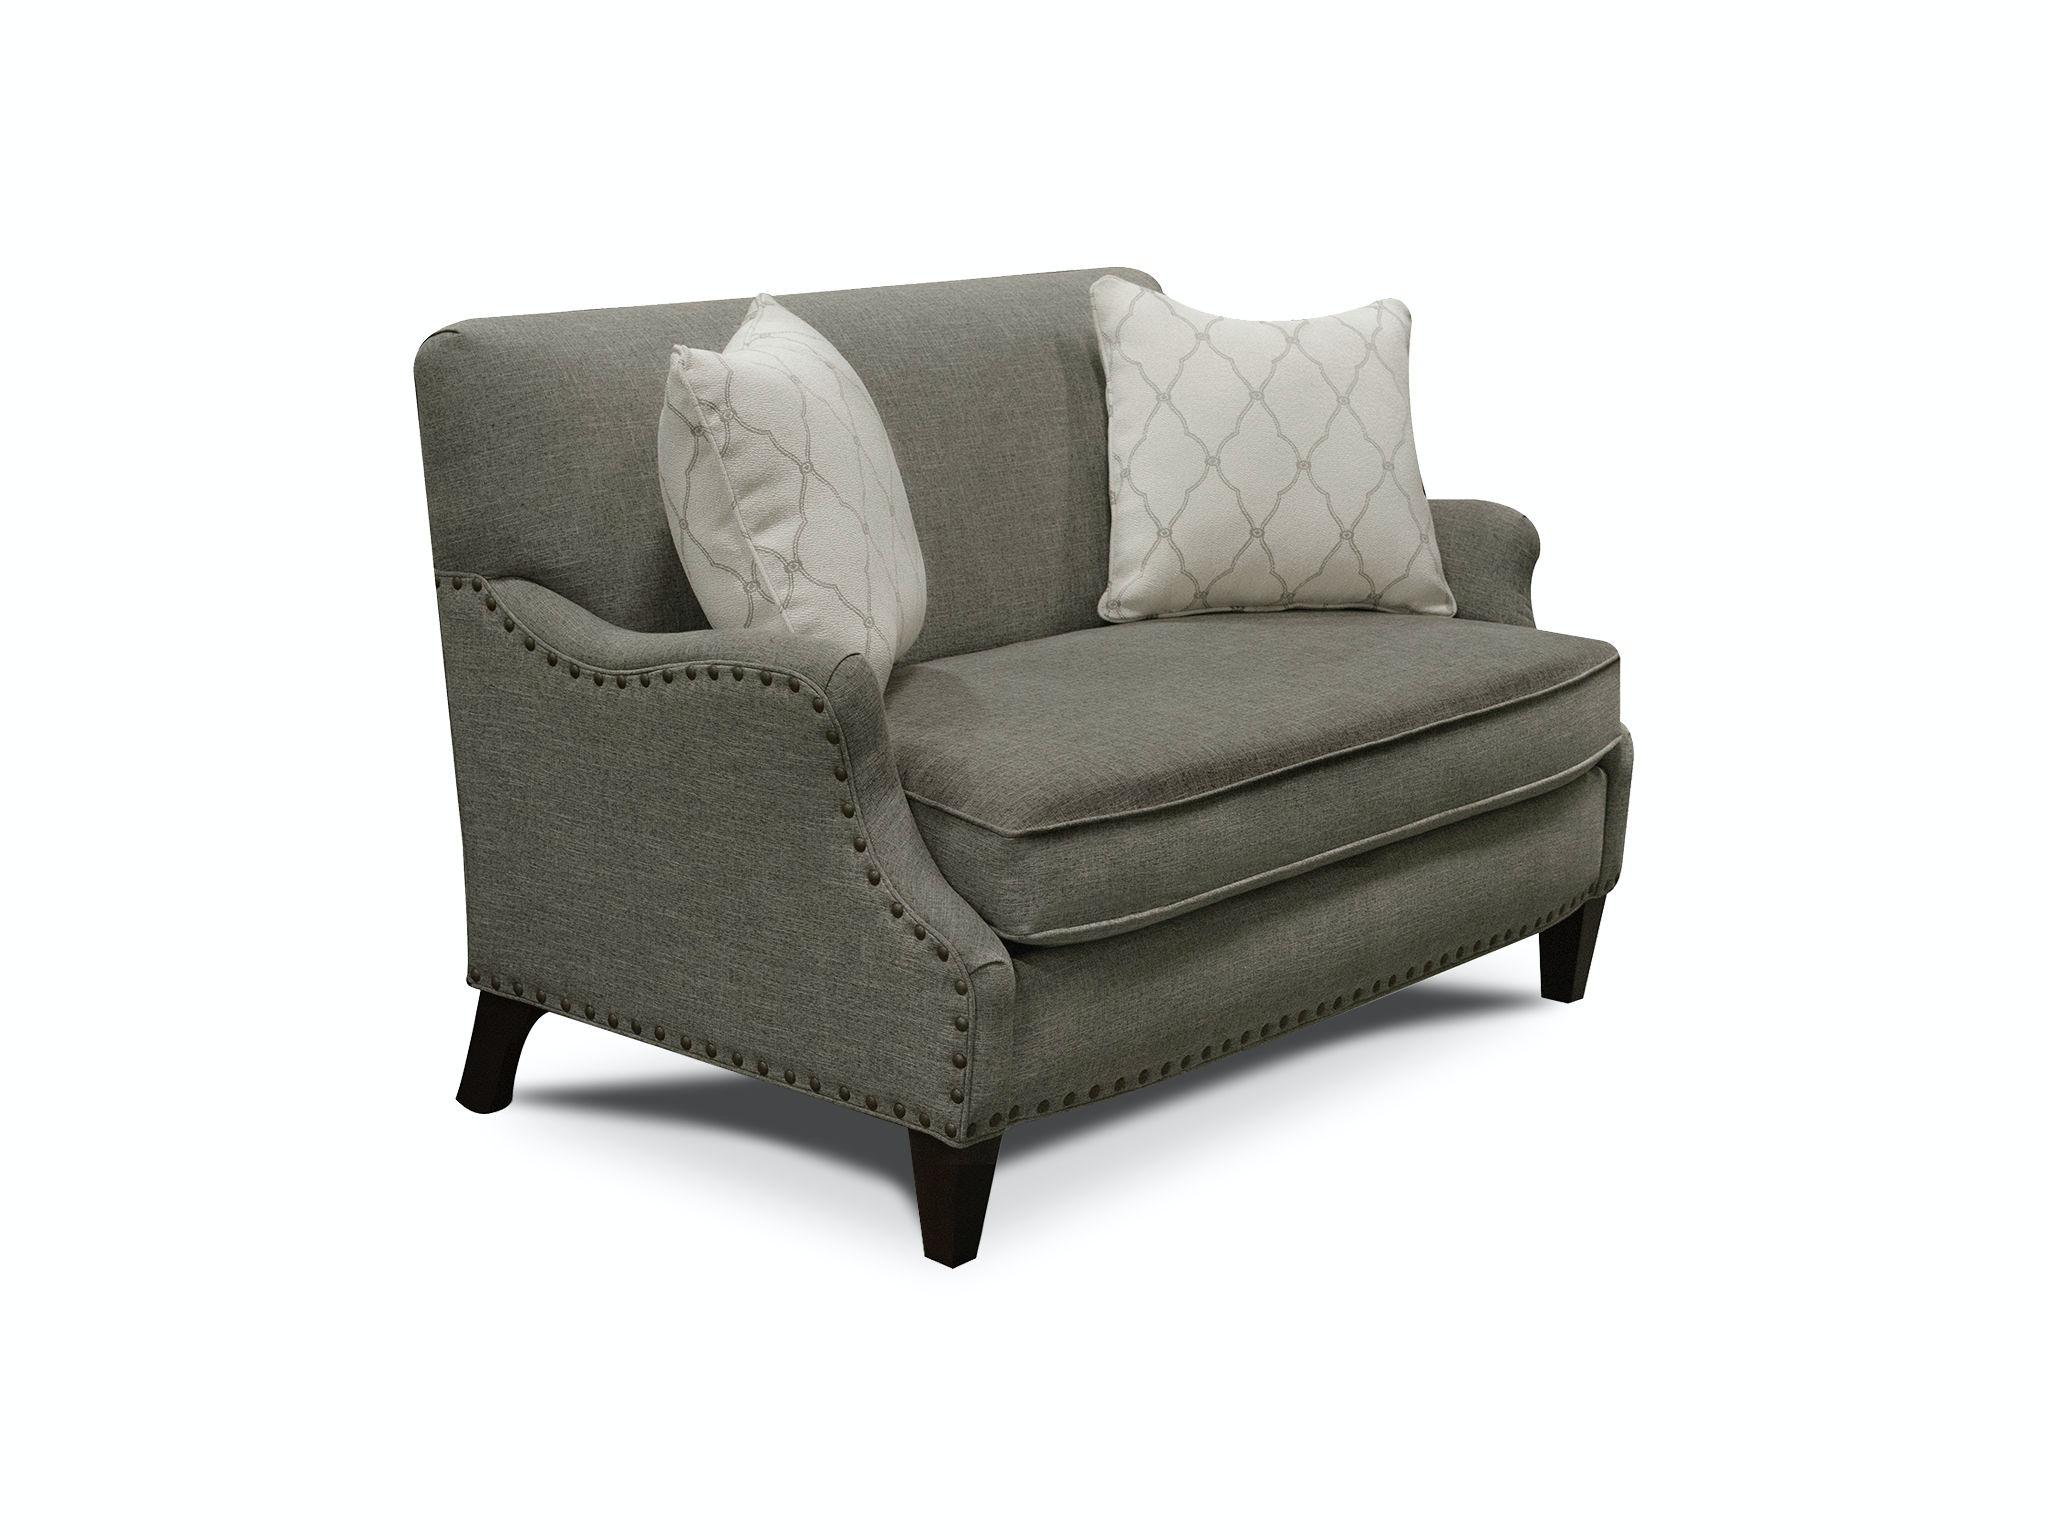 Grevior Furniture